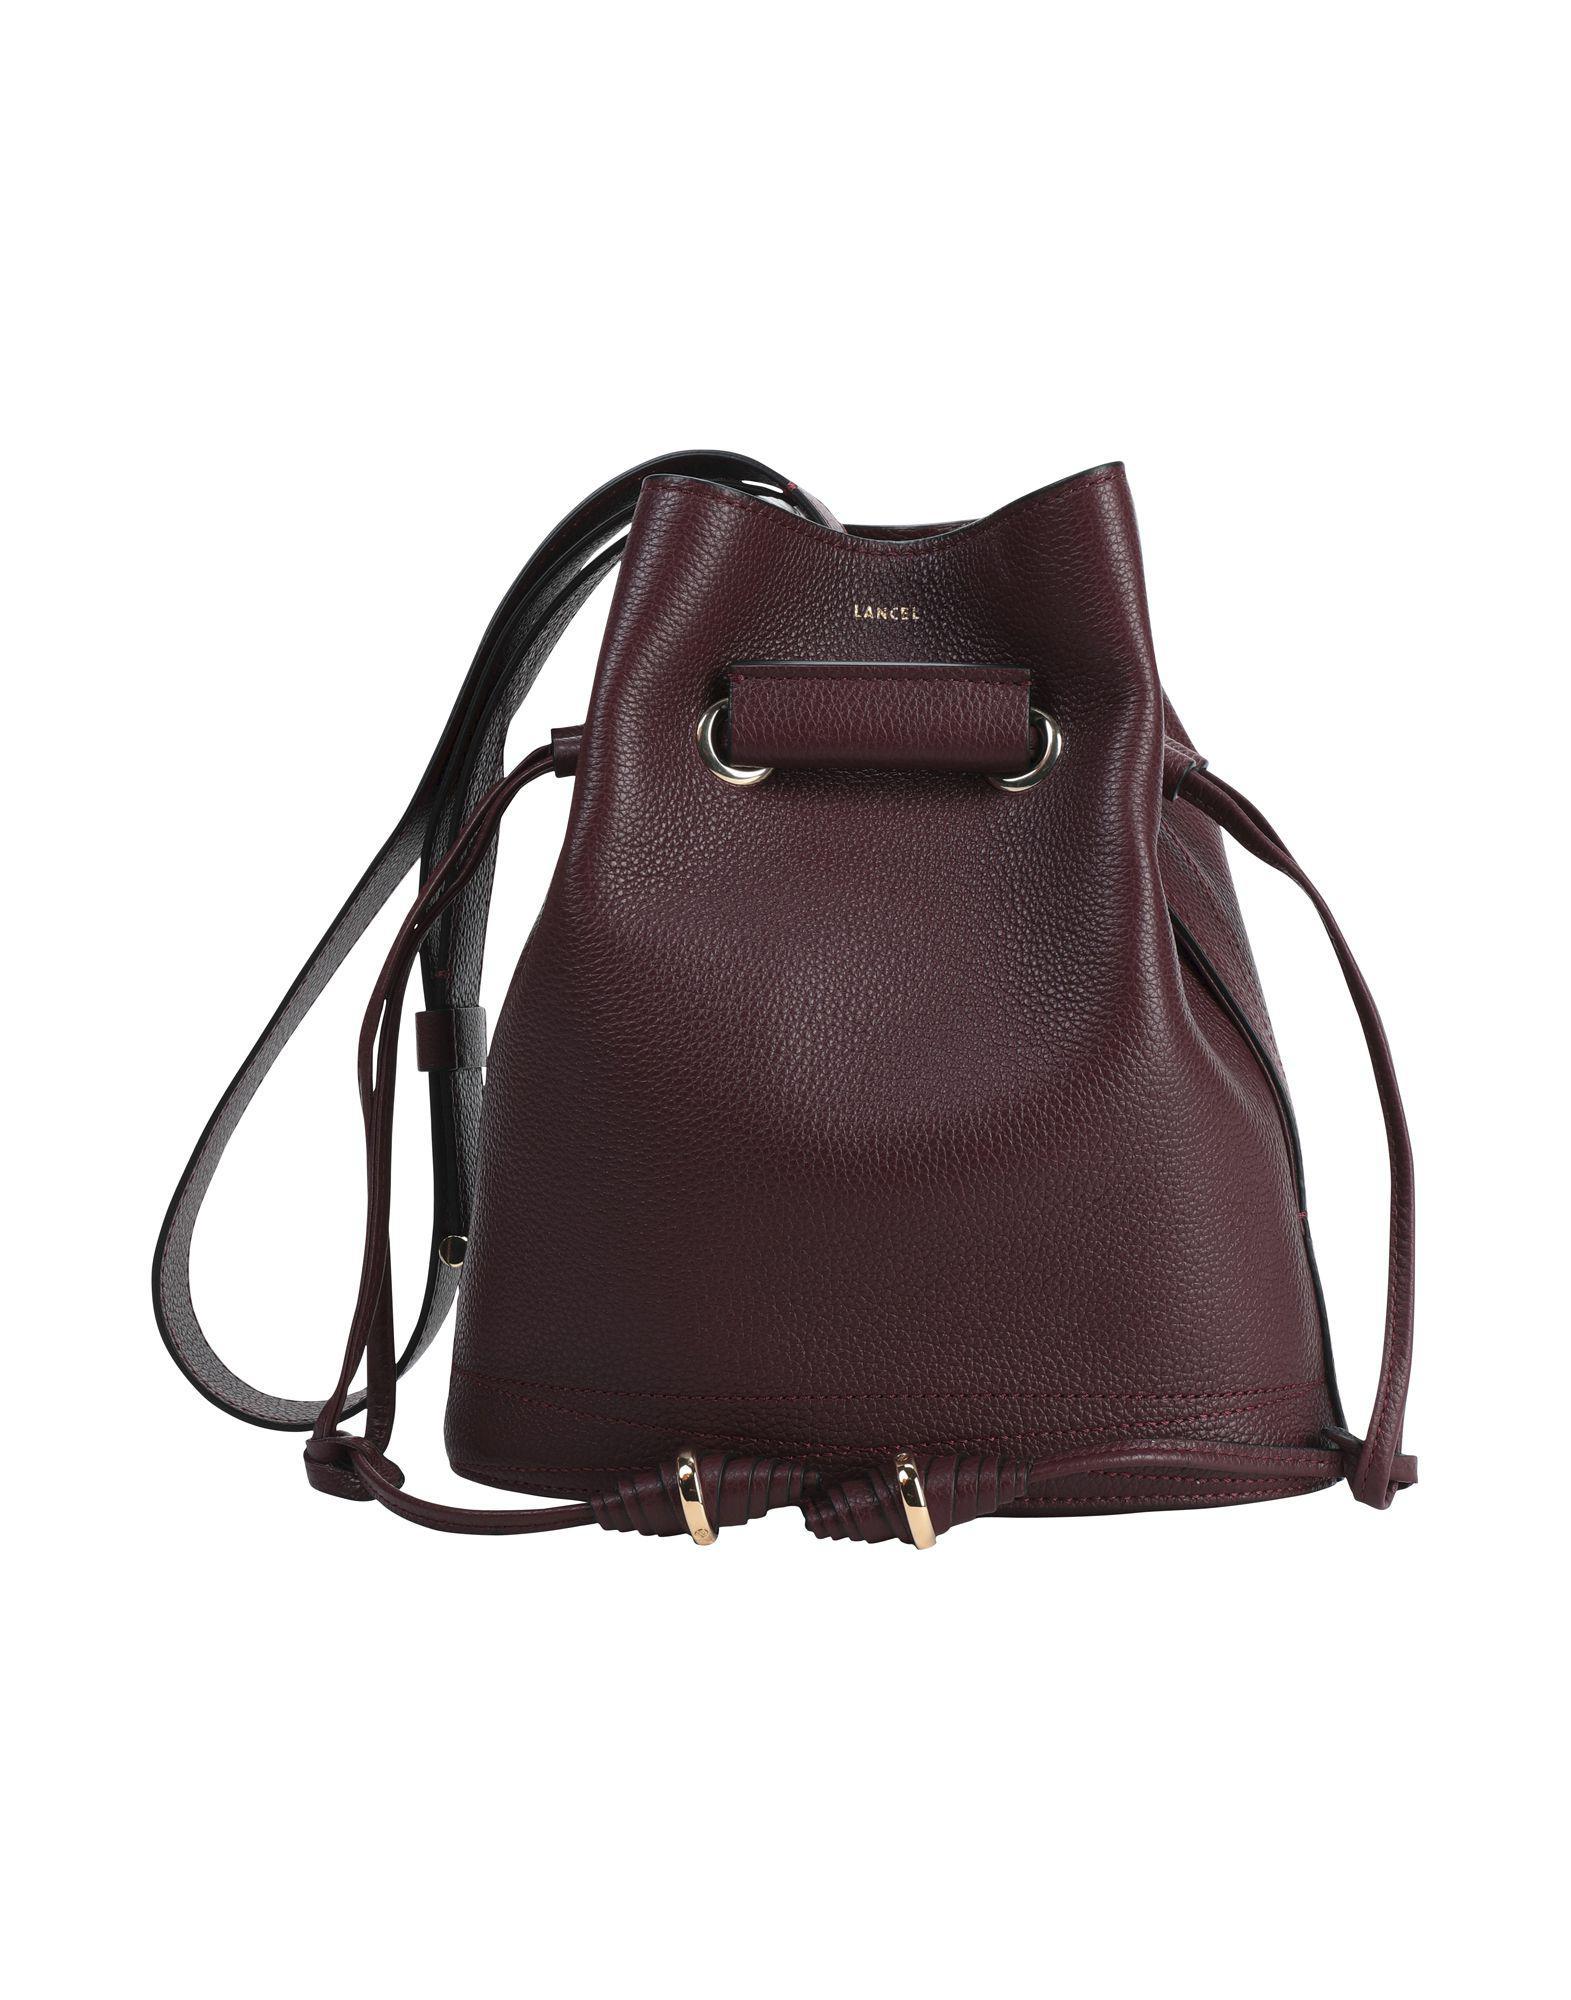 b2a34c6e82 Lancel - Multicolor Cross-body Bag - Lyst. View fullscreen